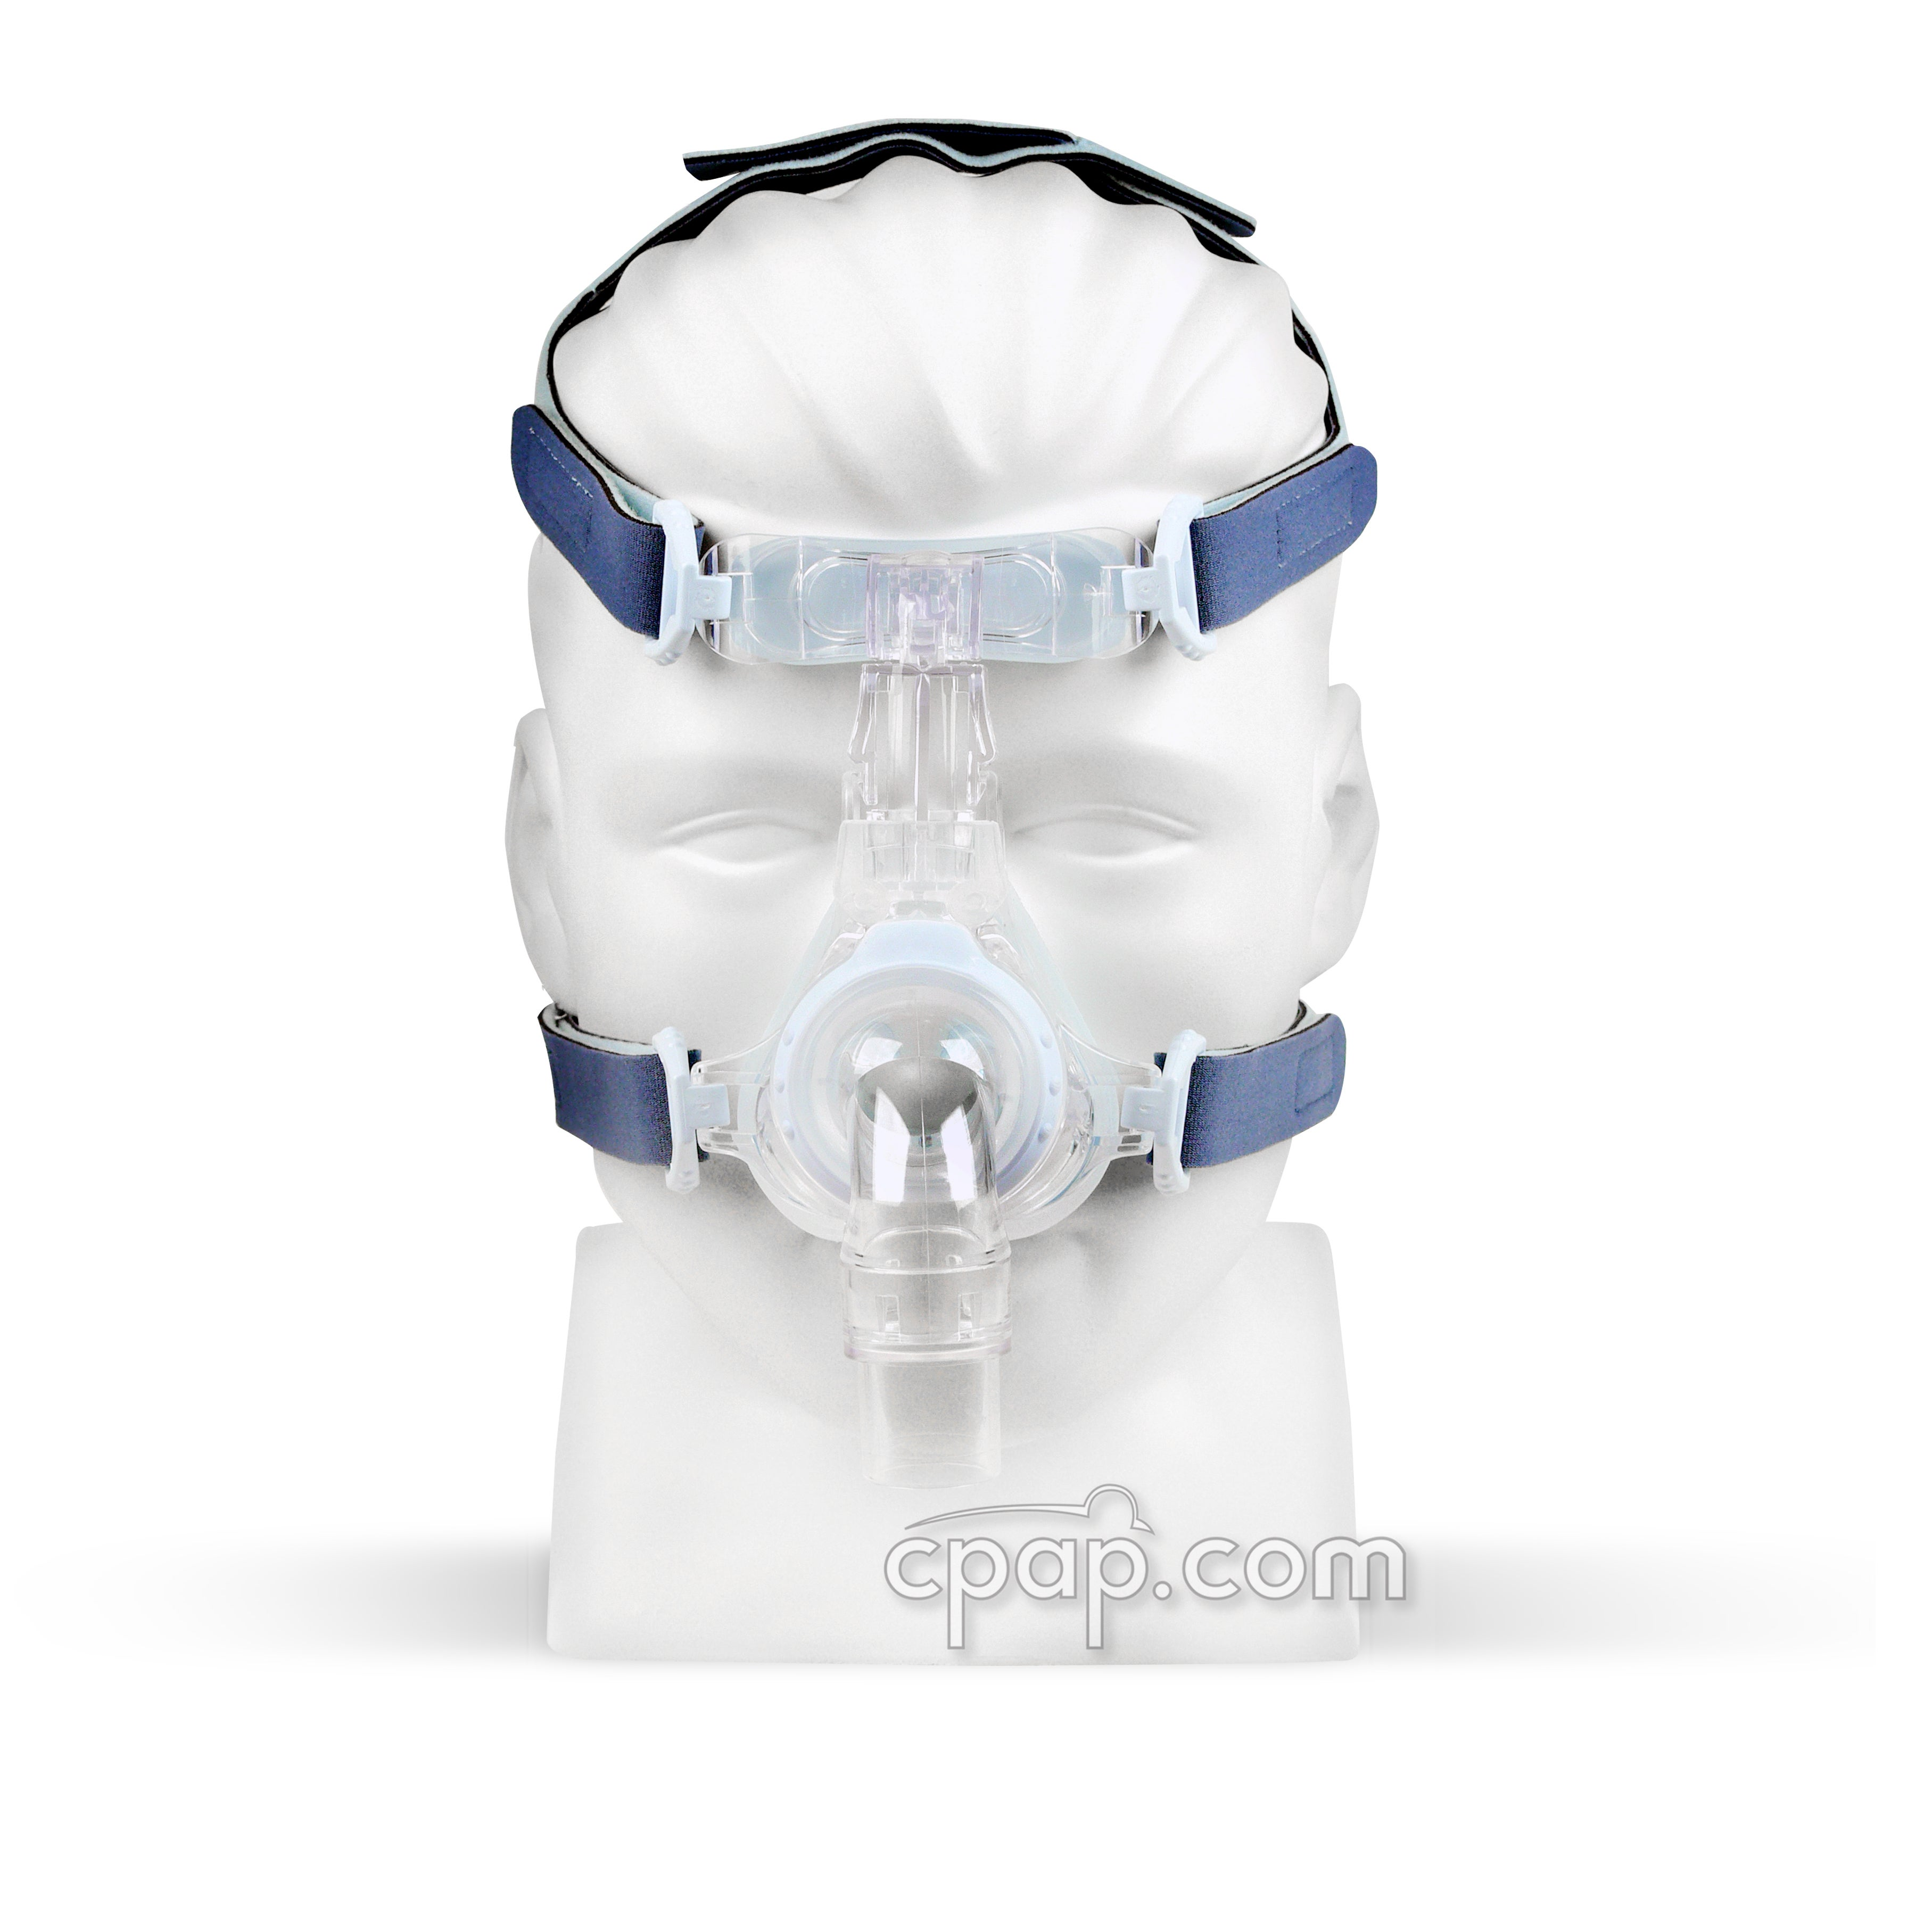 EasyFit SilkGel Full Face Mask (front on mannequin - not included)